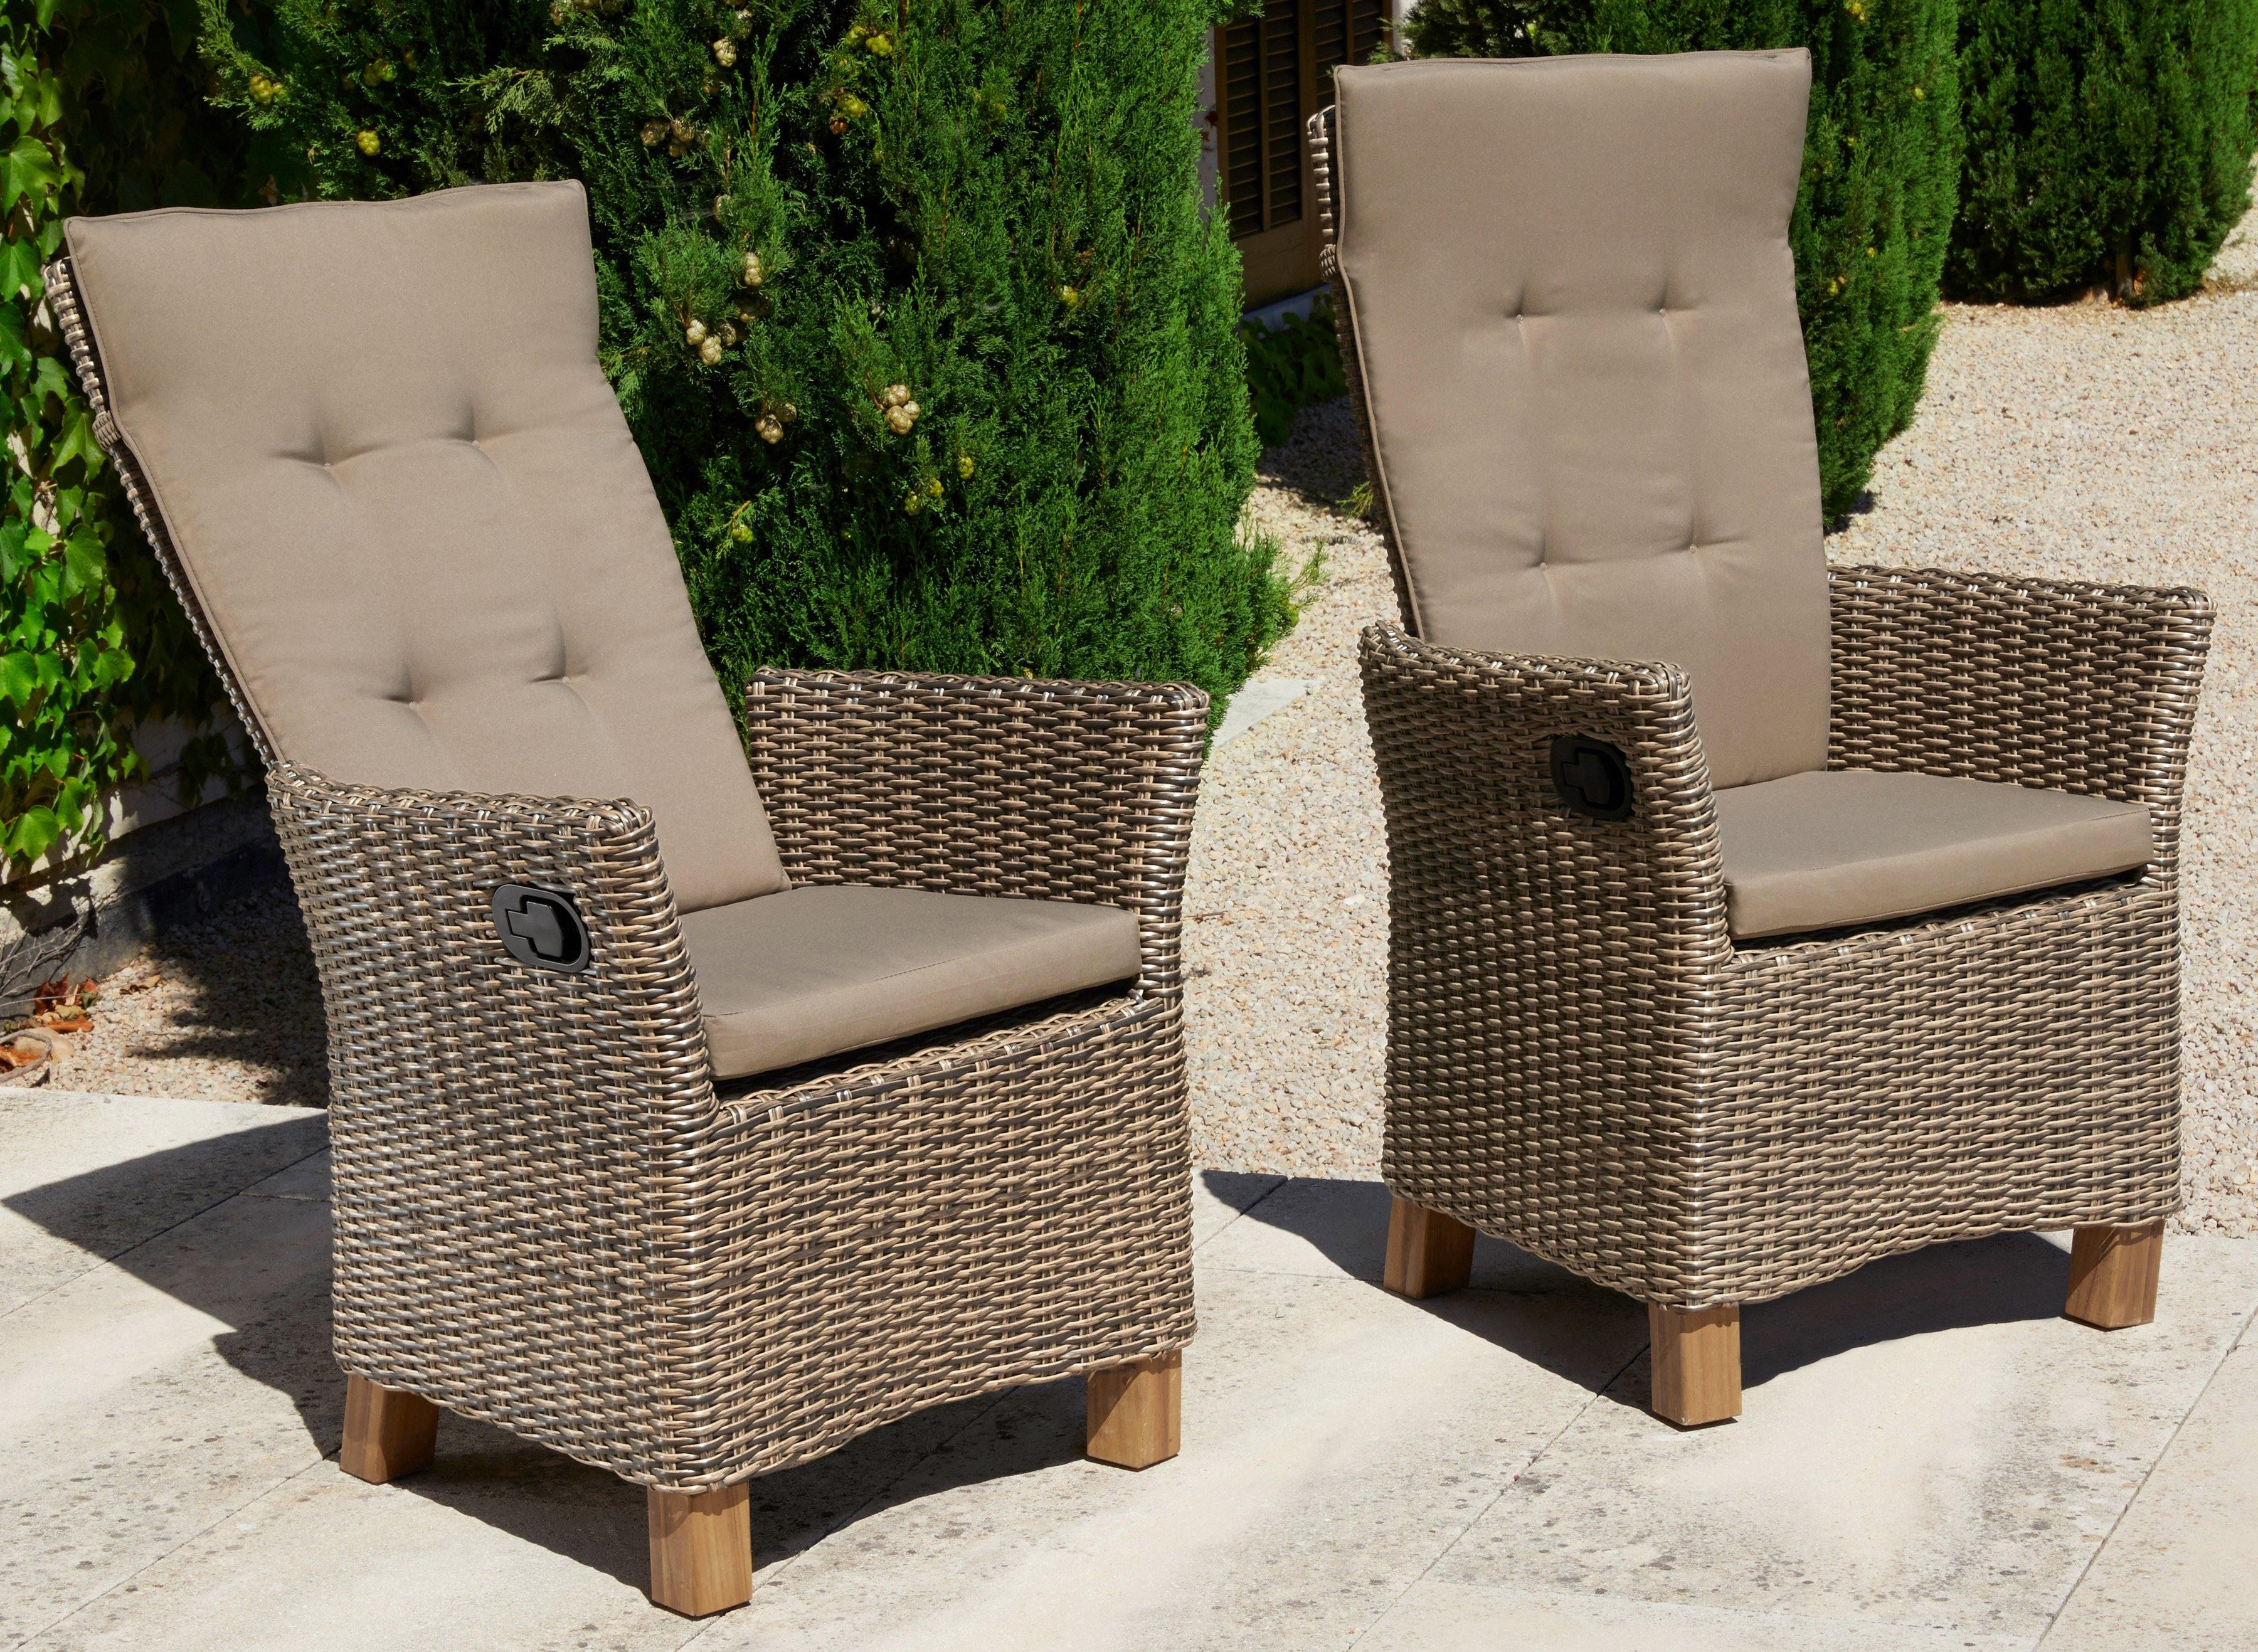 2 Verstelbare Tuinstoelen.Merxx Tuinstoel Toscane Set Van 2 Poly Rotan Verstelbaar